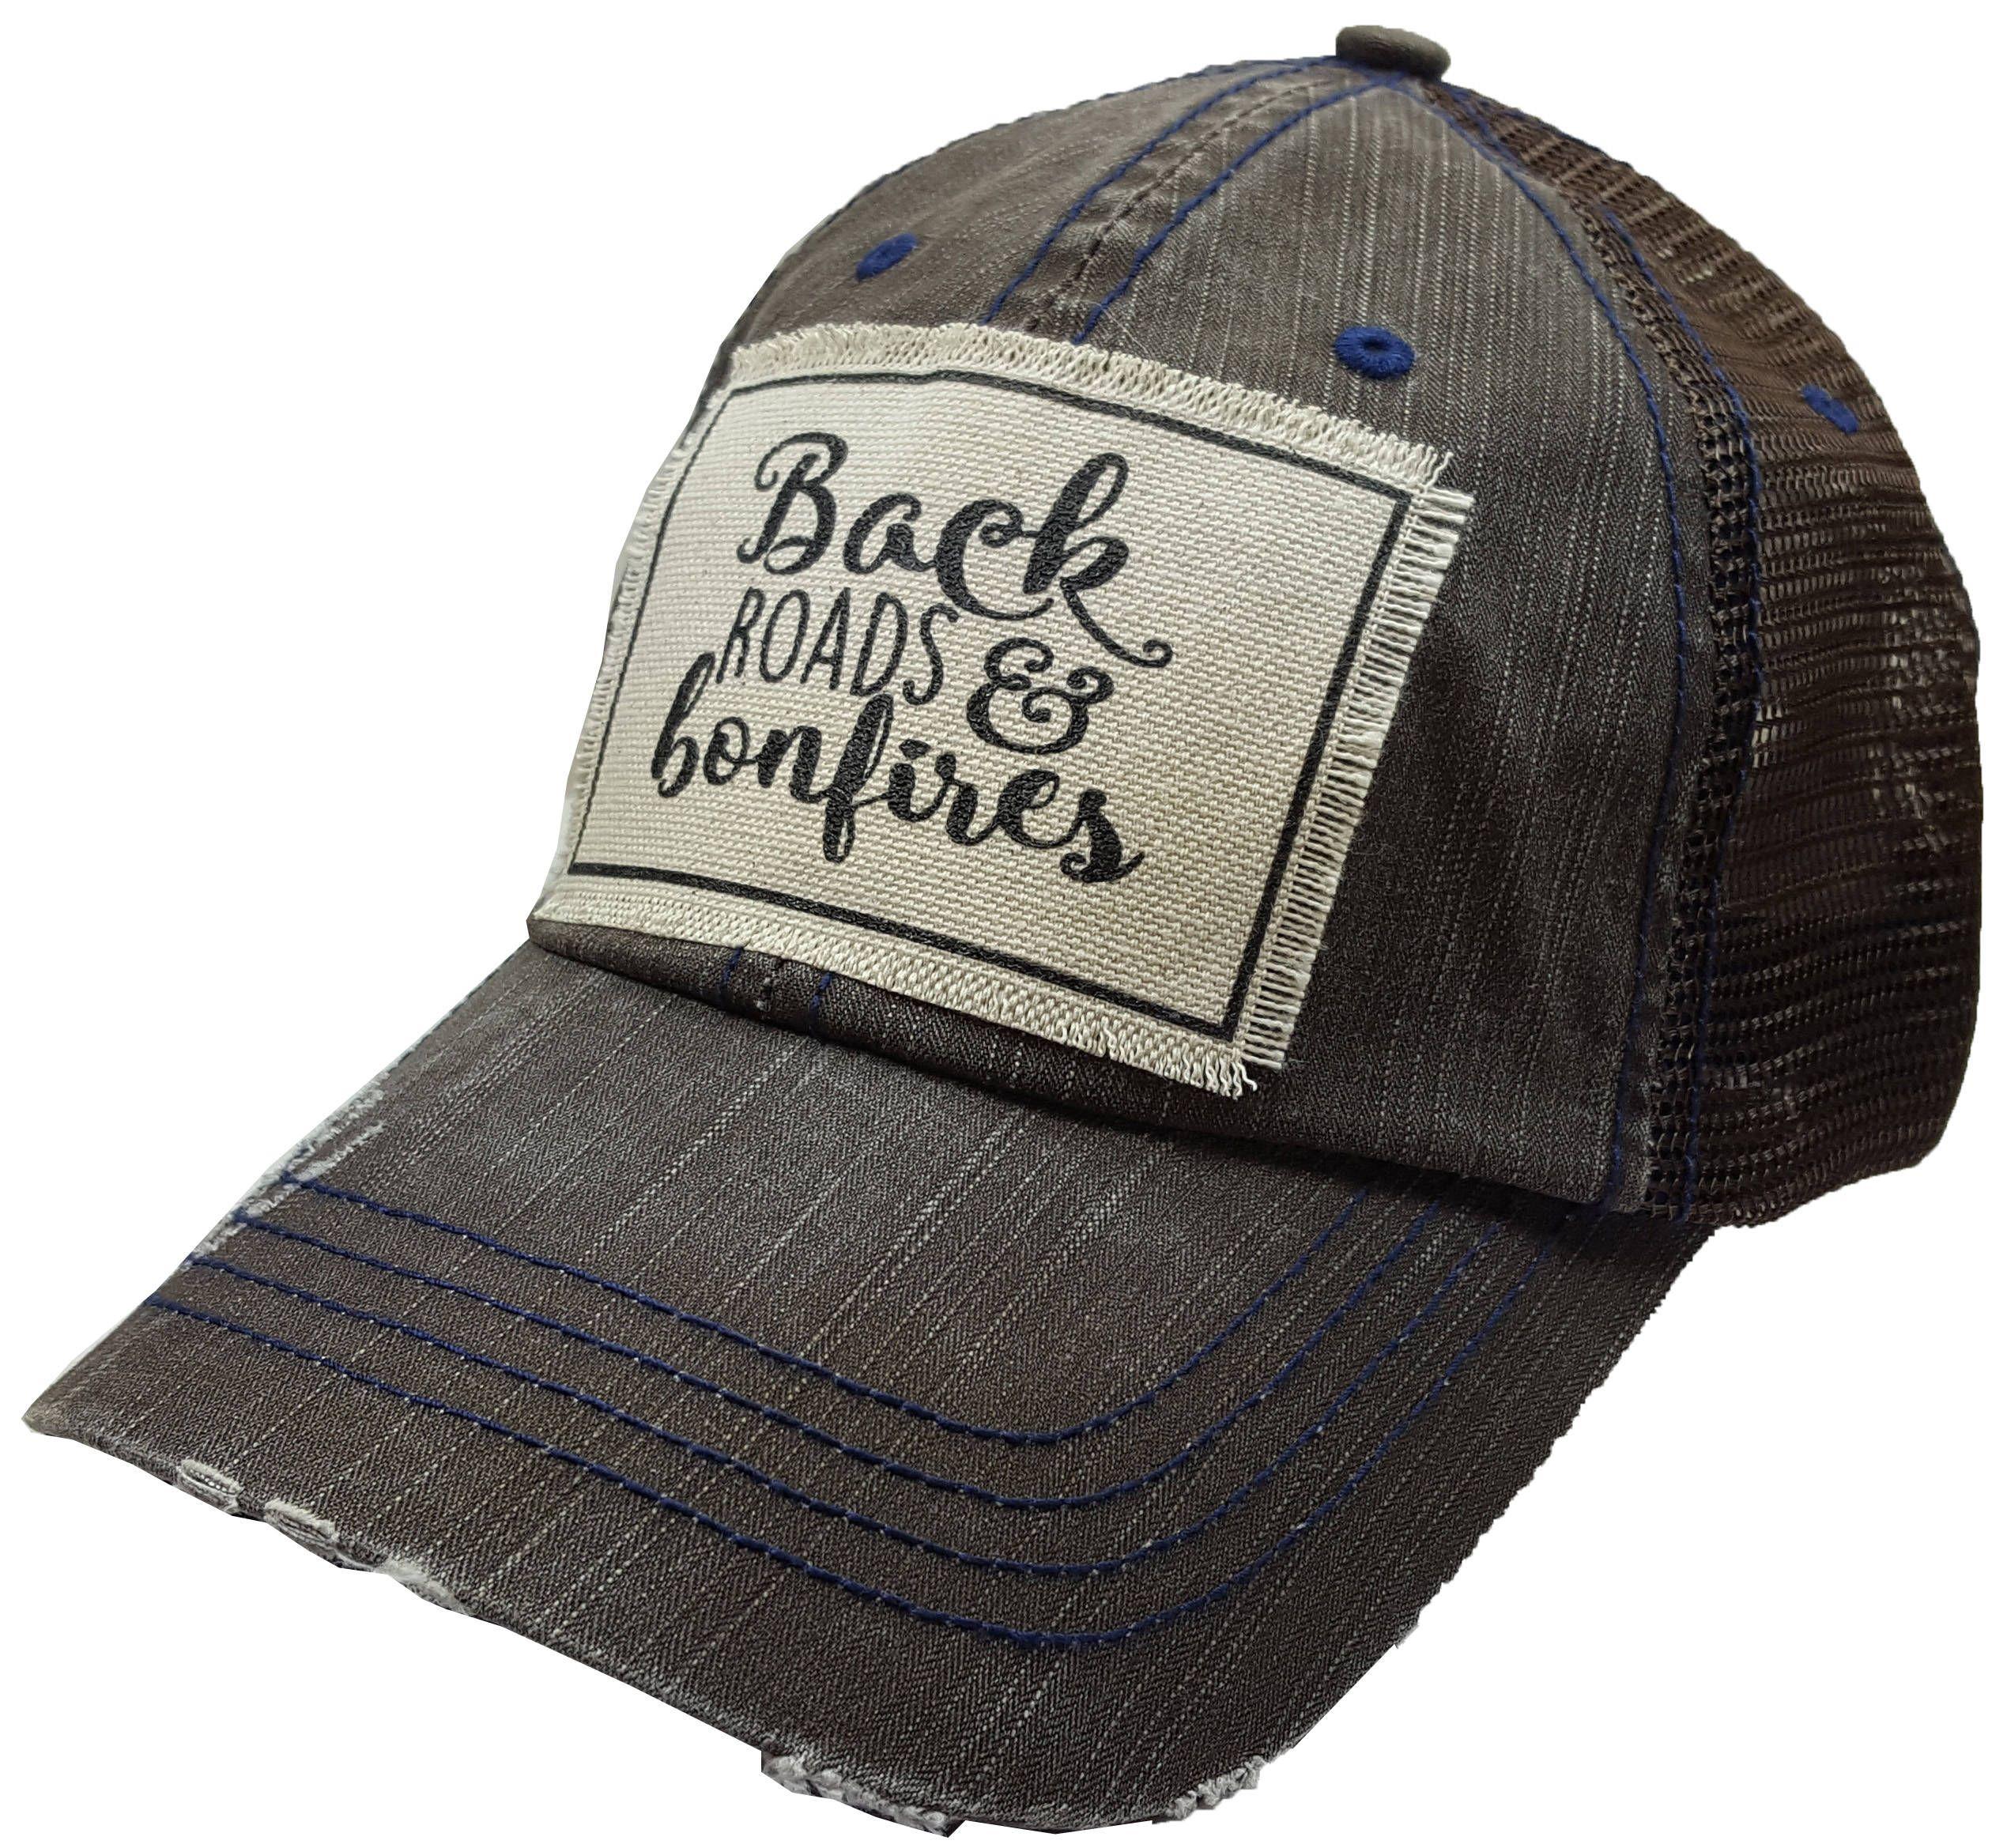 Back Roads Bonfires Distressed Trucker Cap Trucker Cap Etsy In 2021 Womens Hats Baseball Leather Cowboy Hats Womens Baseball Cap